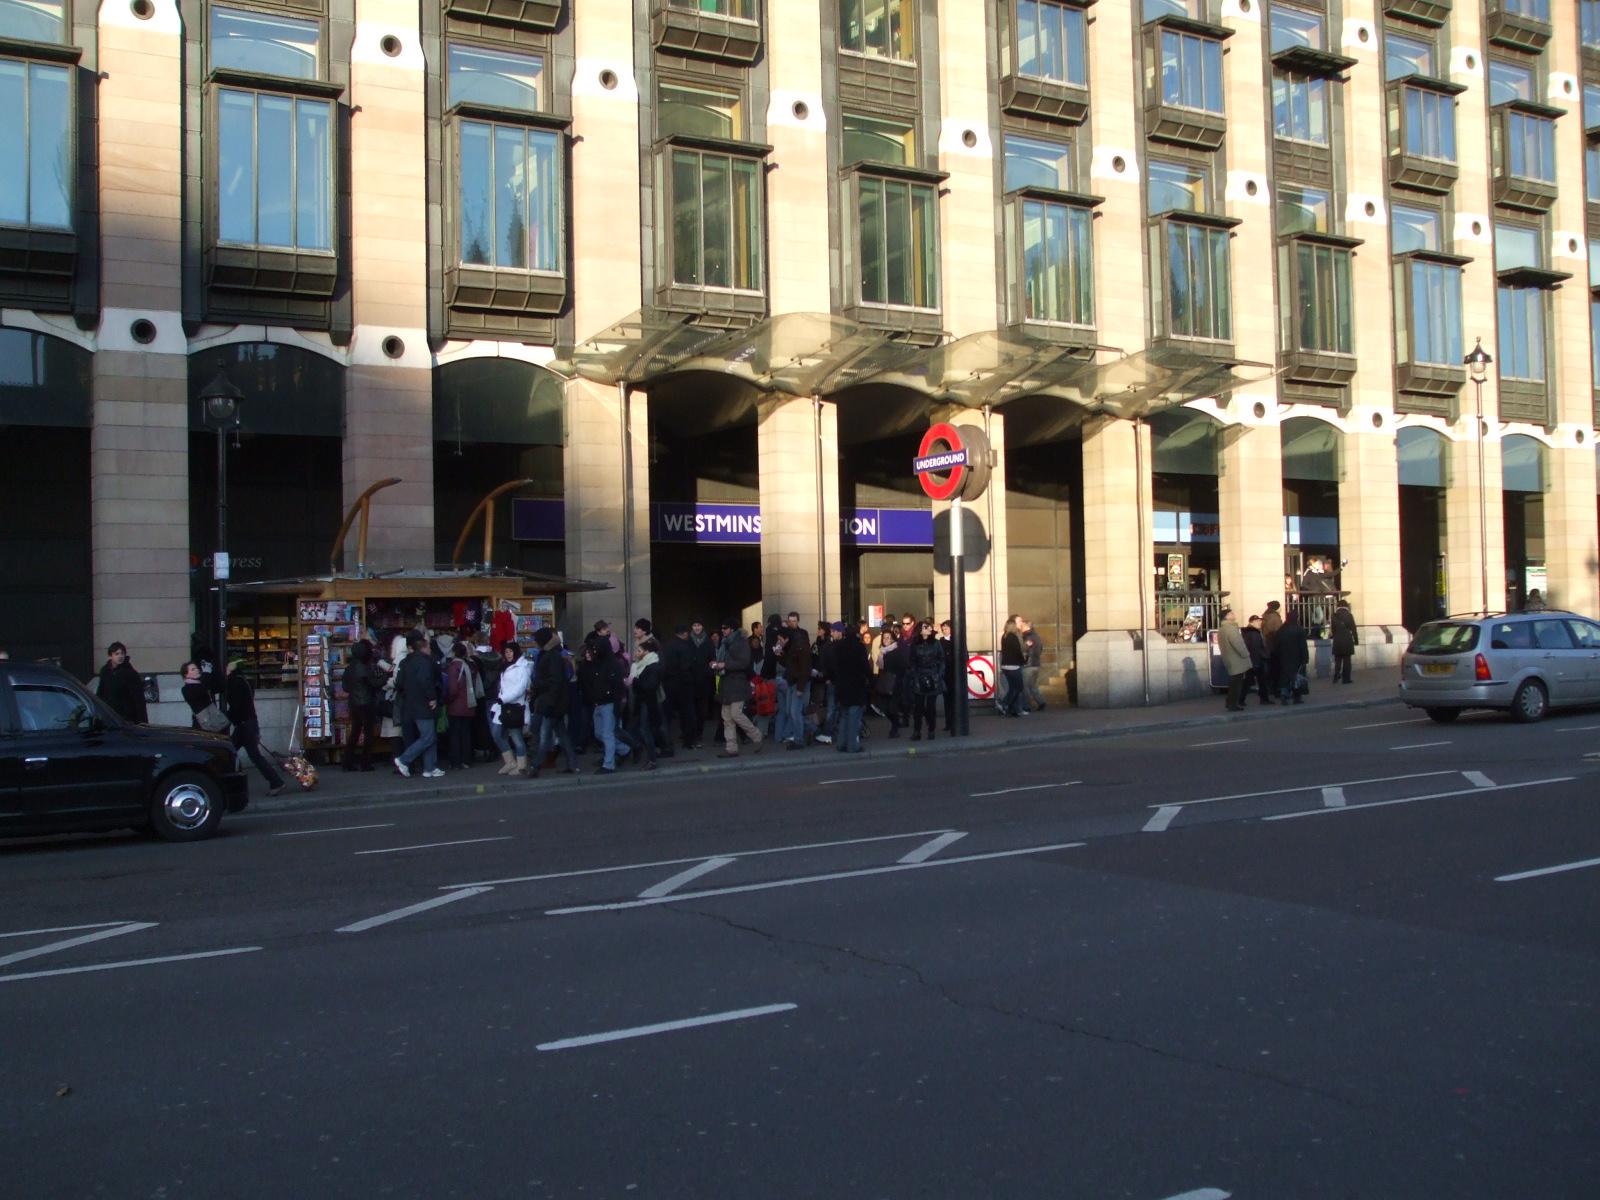 Westminster Metropolitana Di Londra Wikipedia